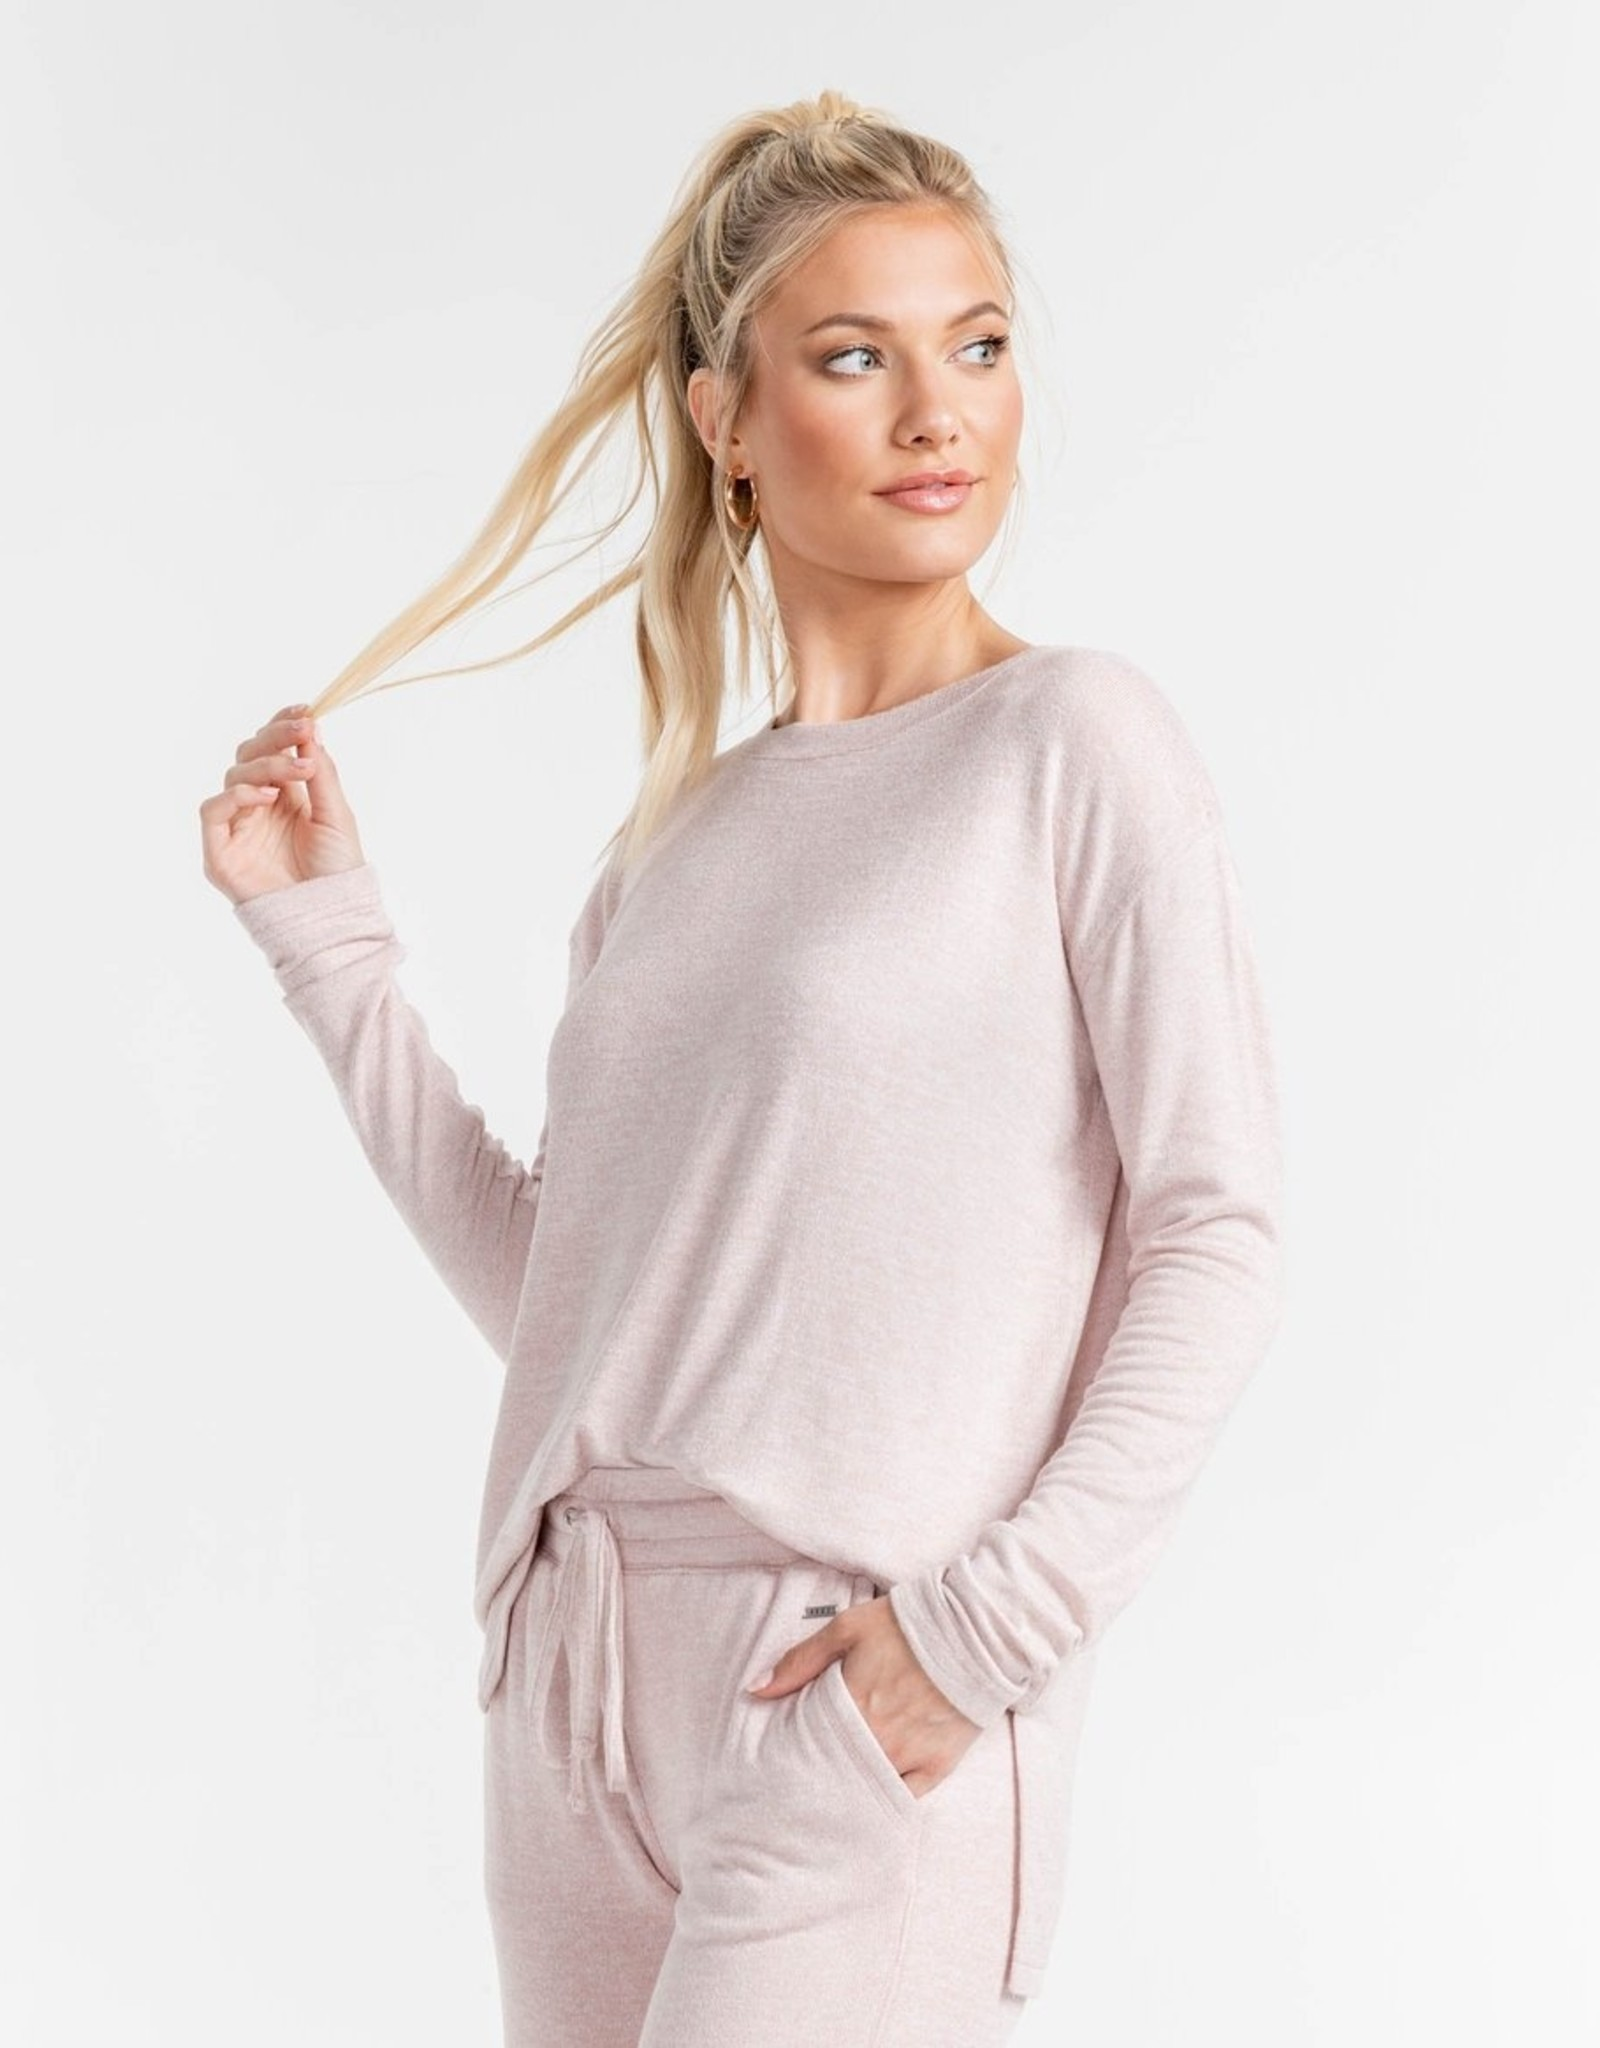 Southern Shirt Sincerely Soft Heather Fleece/2J048